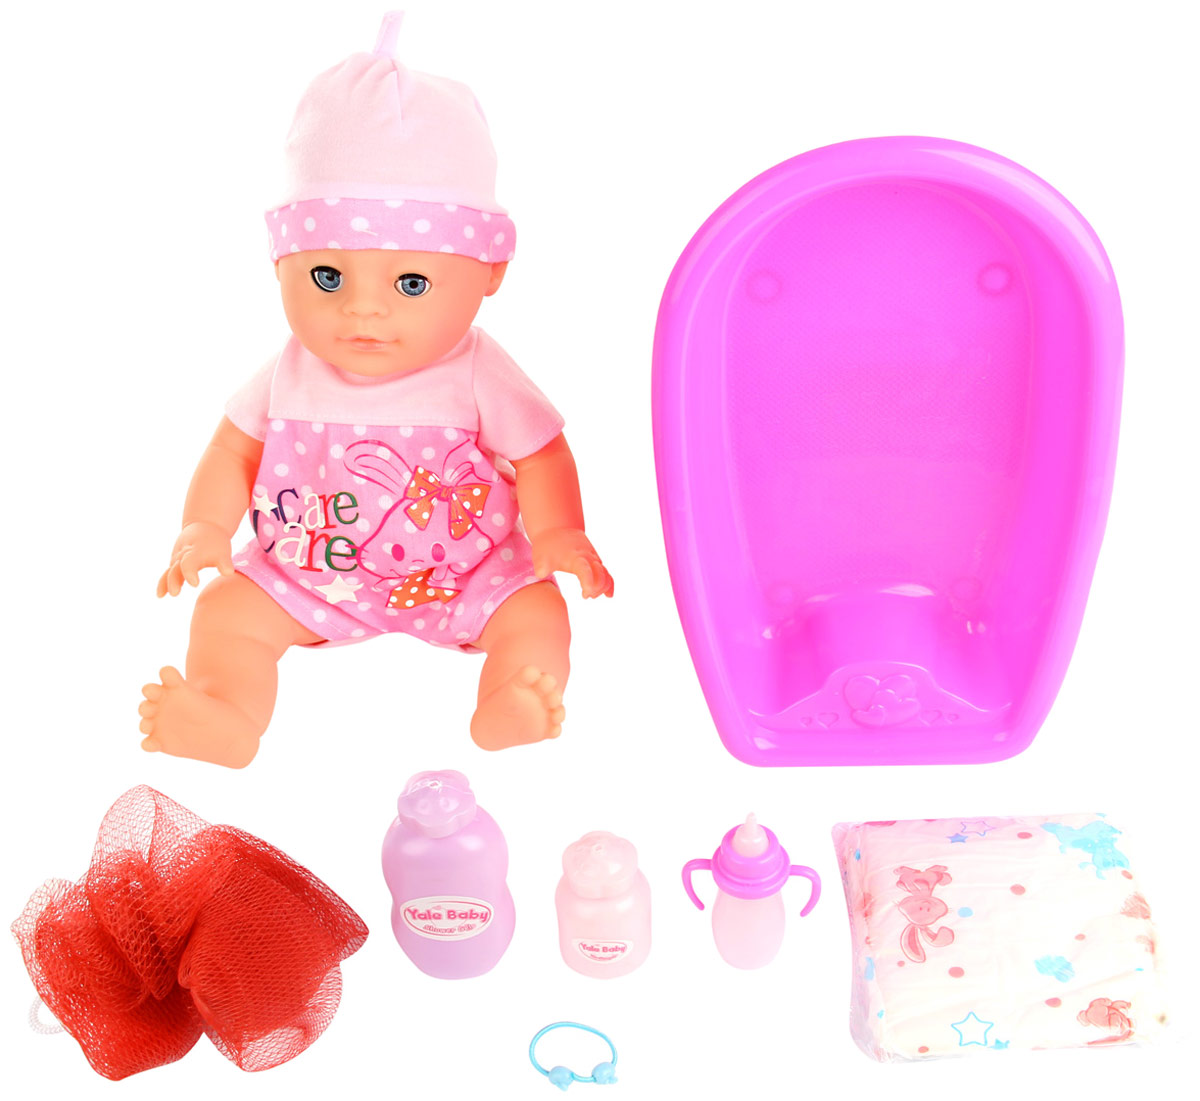 Lisa Jane Пупс с ванной 59474 lisa jane пупс с ванной 35 см 59476